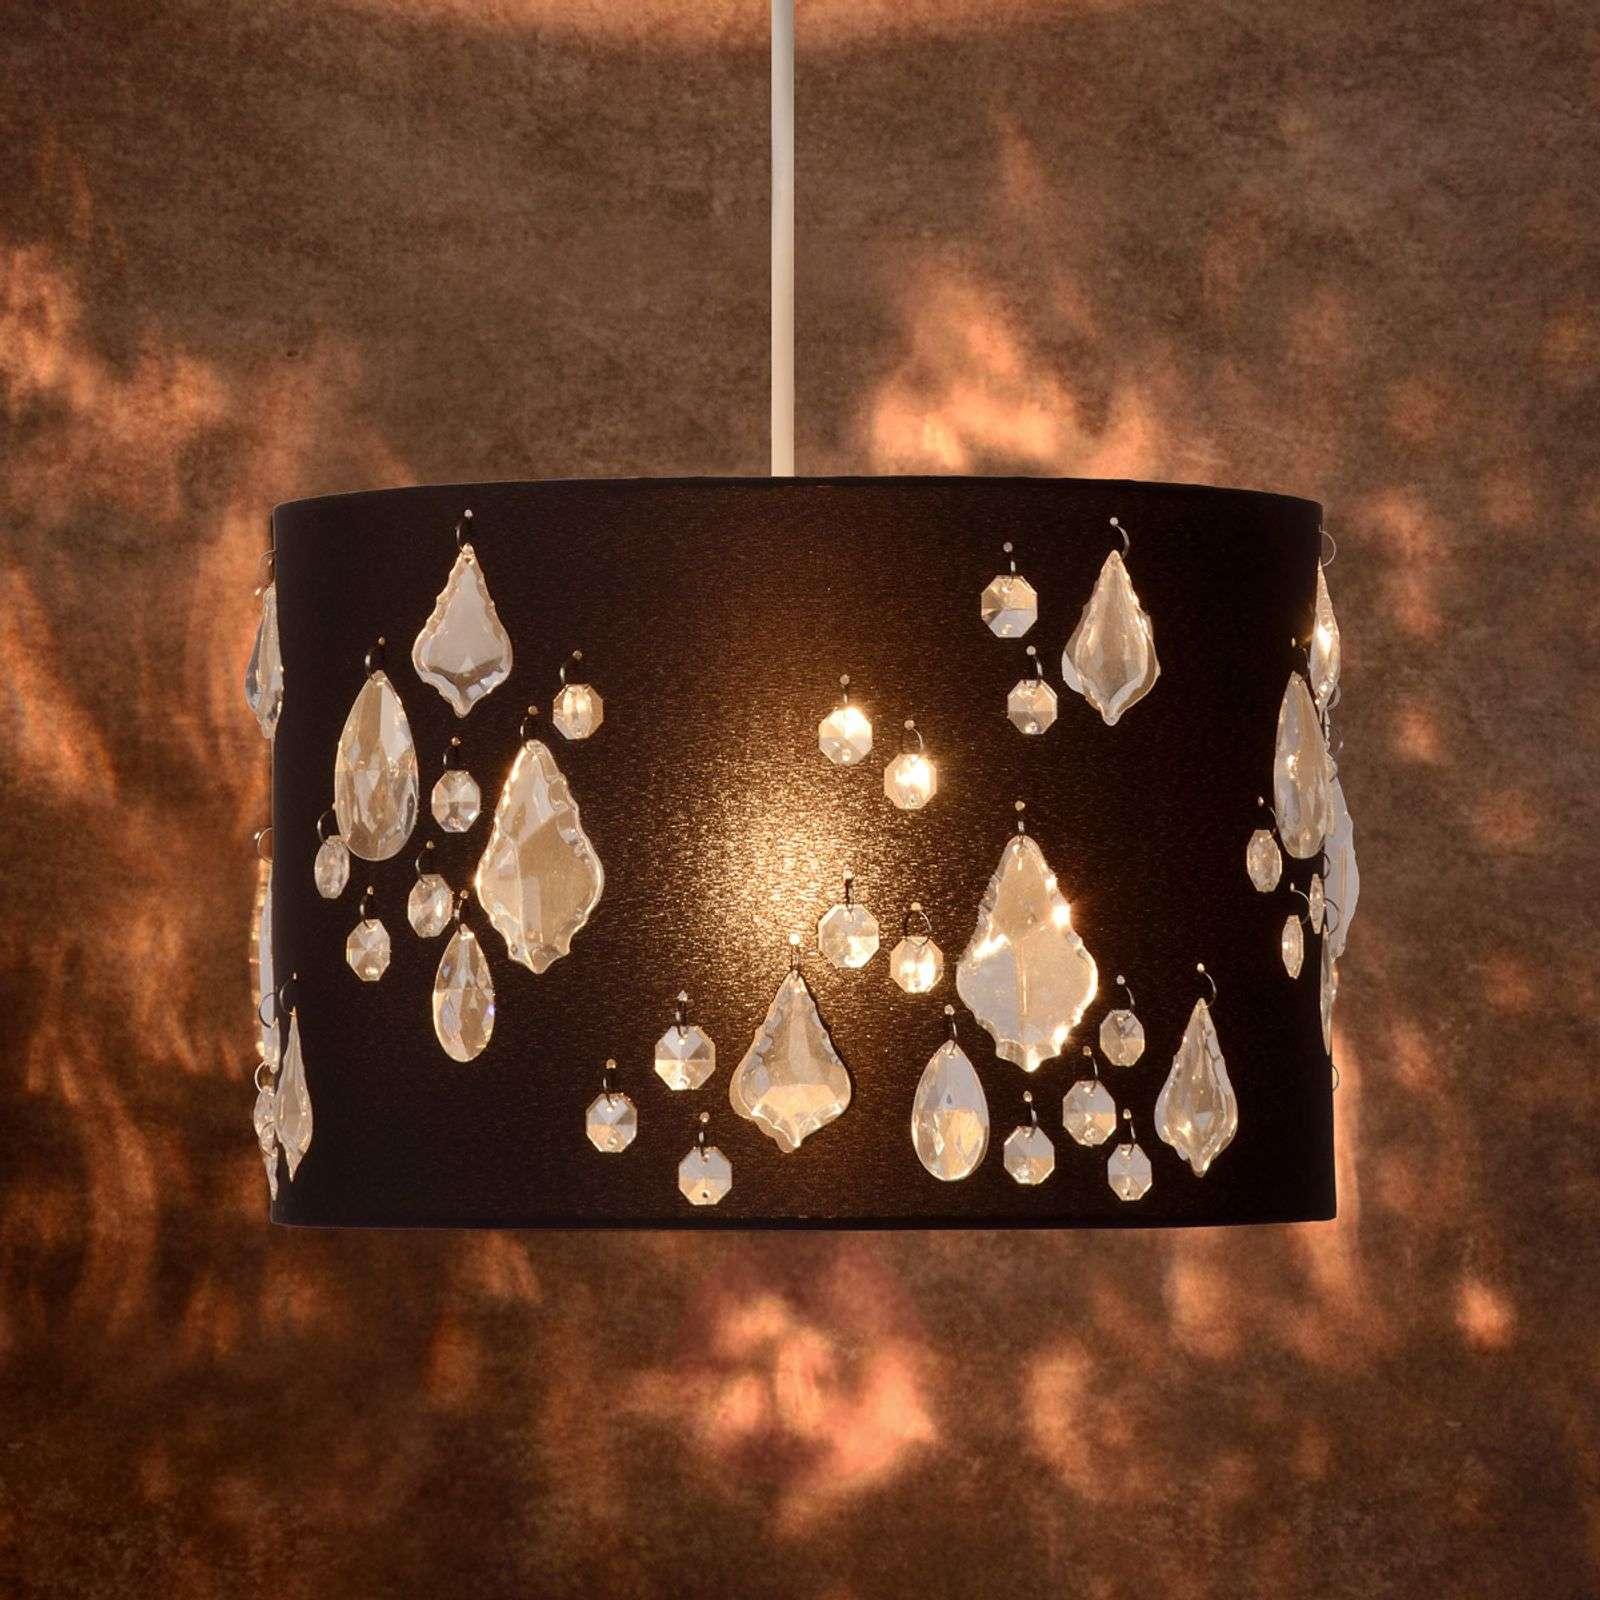 Sierstrip Chroom Badkamer : Spilti extravagant hanging light black lights.ie